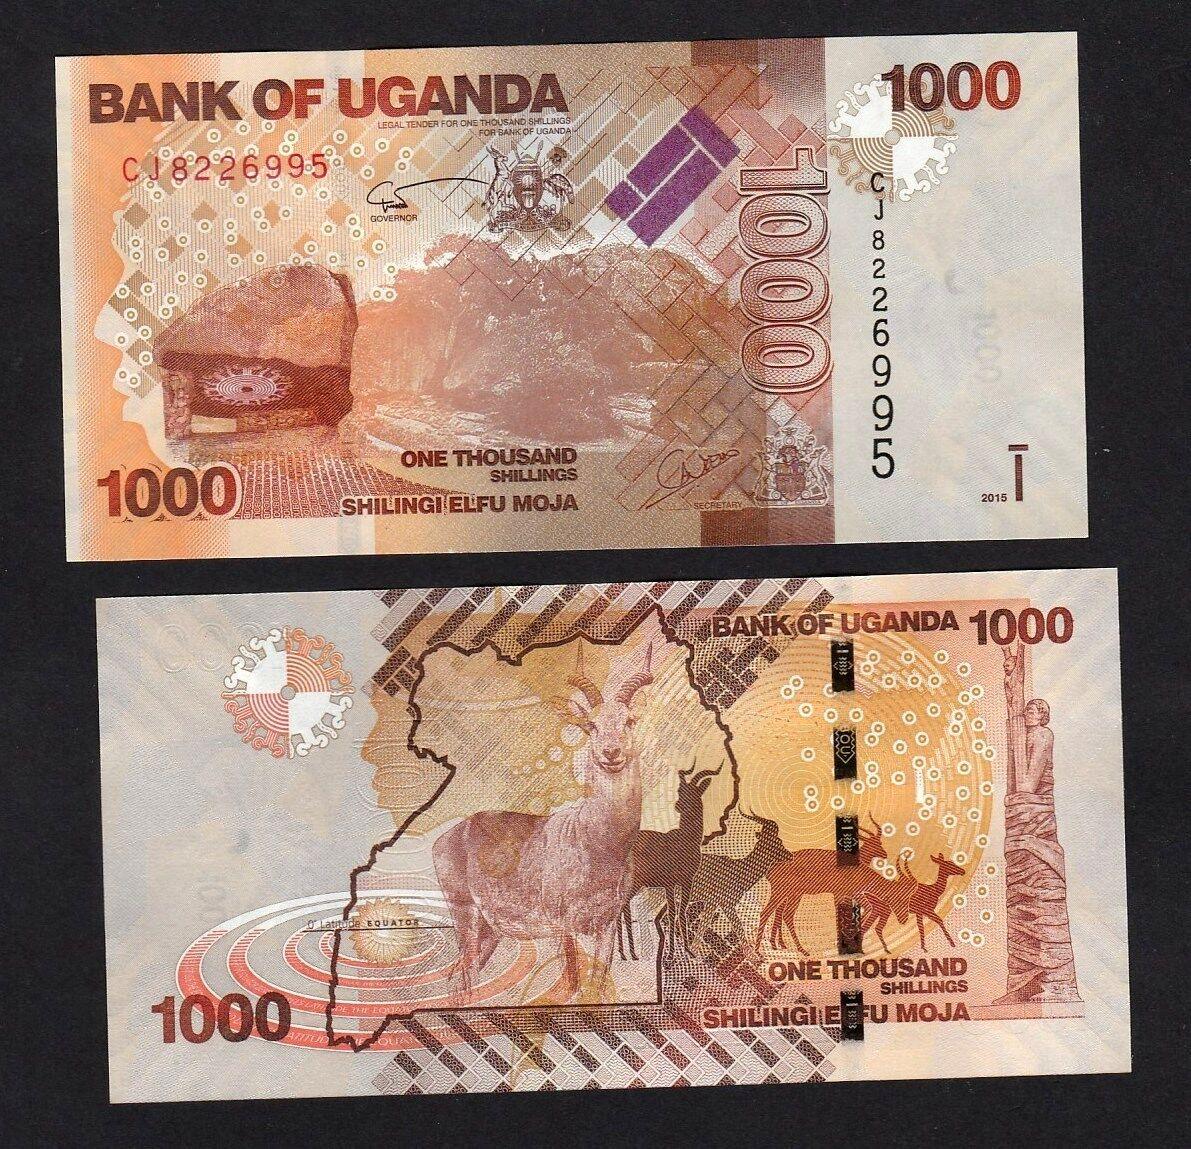 UGANDA 1000 Shillings P-49d UNC Banknote Paper Money 2015